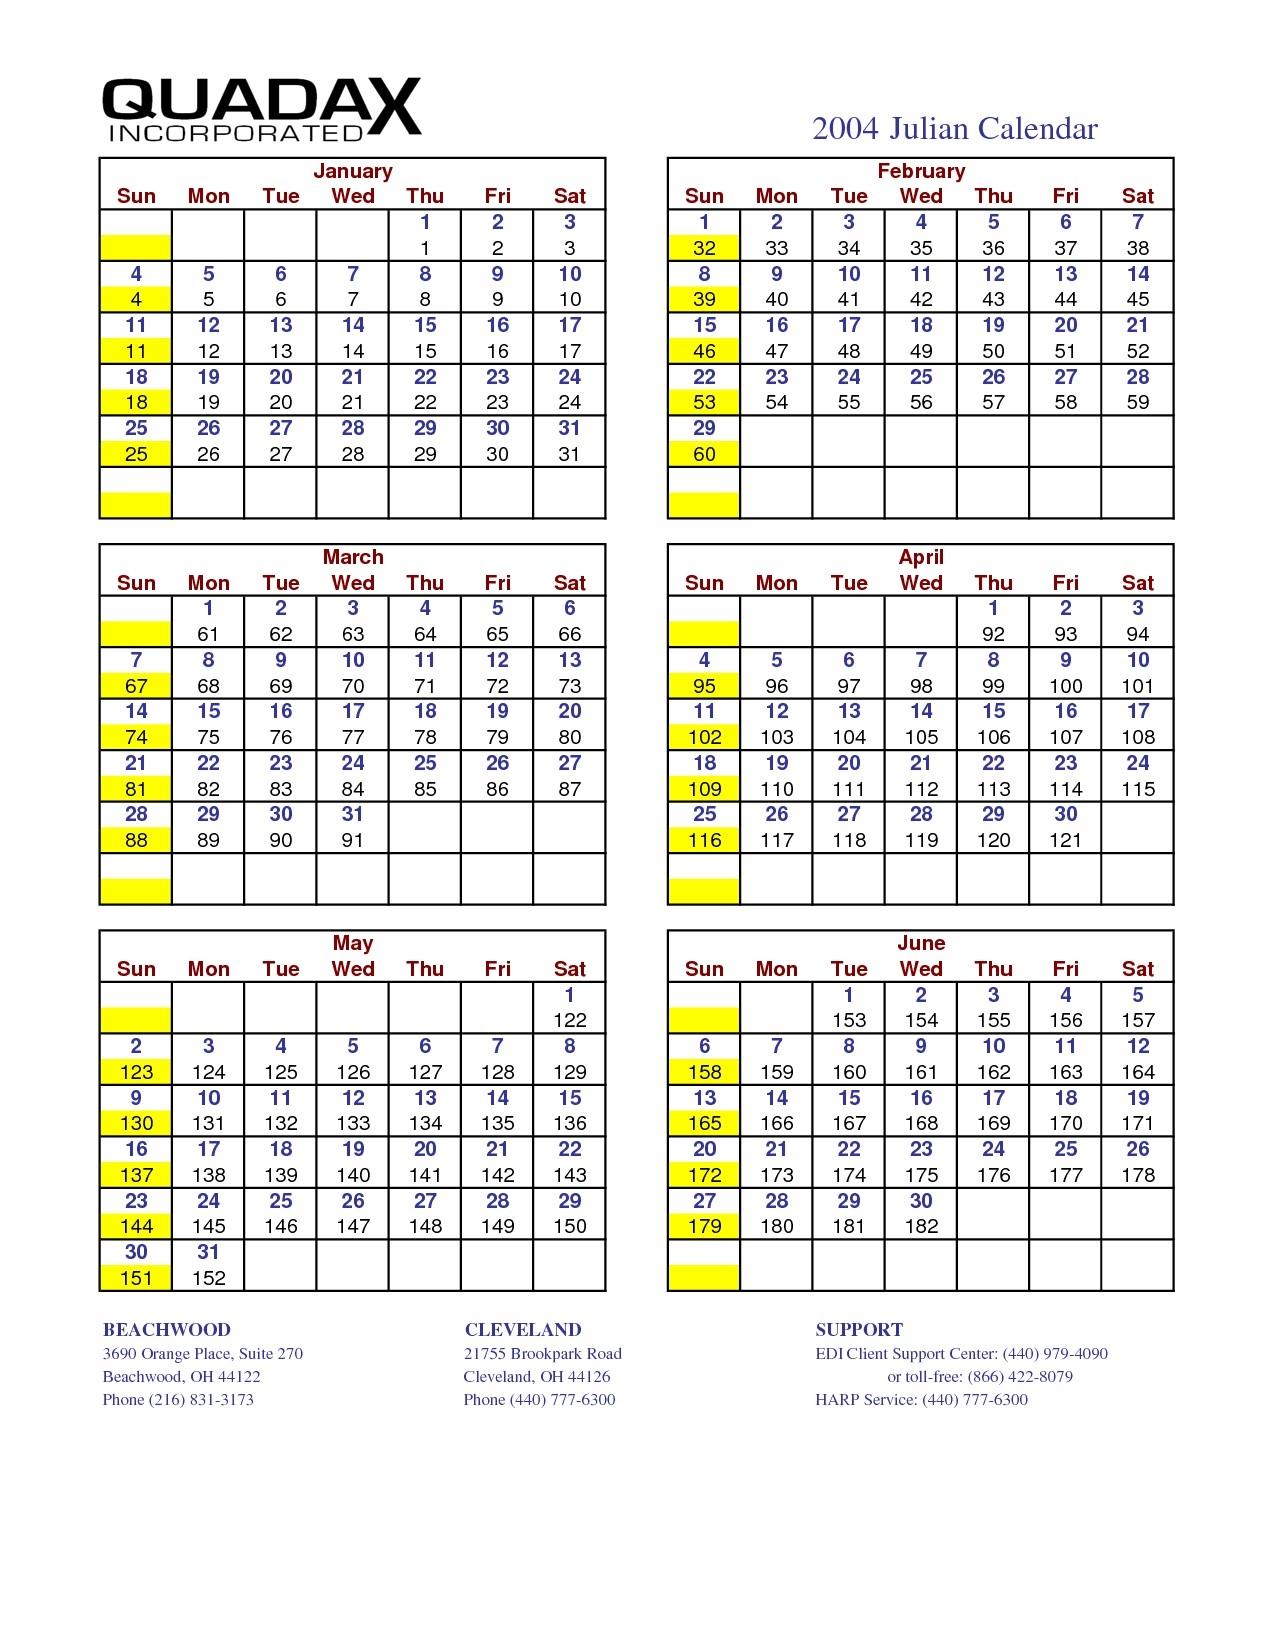 Calendar Julian 2021 Quadax | Free Printable Calendar regarding Calendar With Numbered Days 2021 Photo